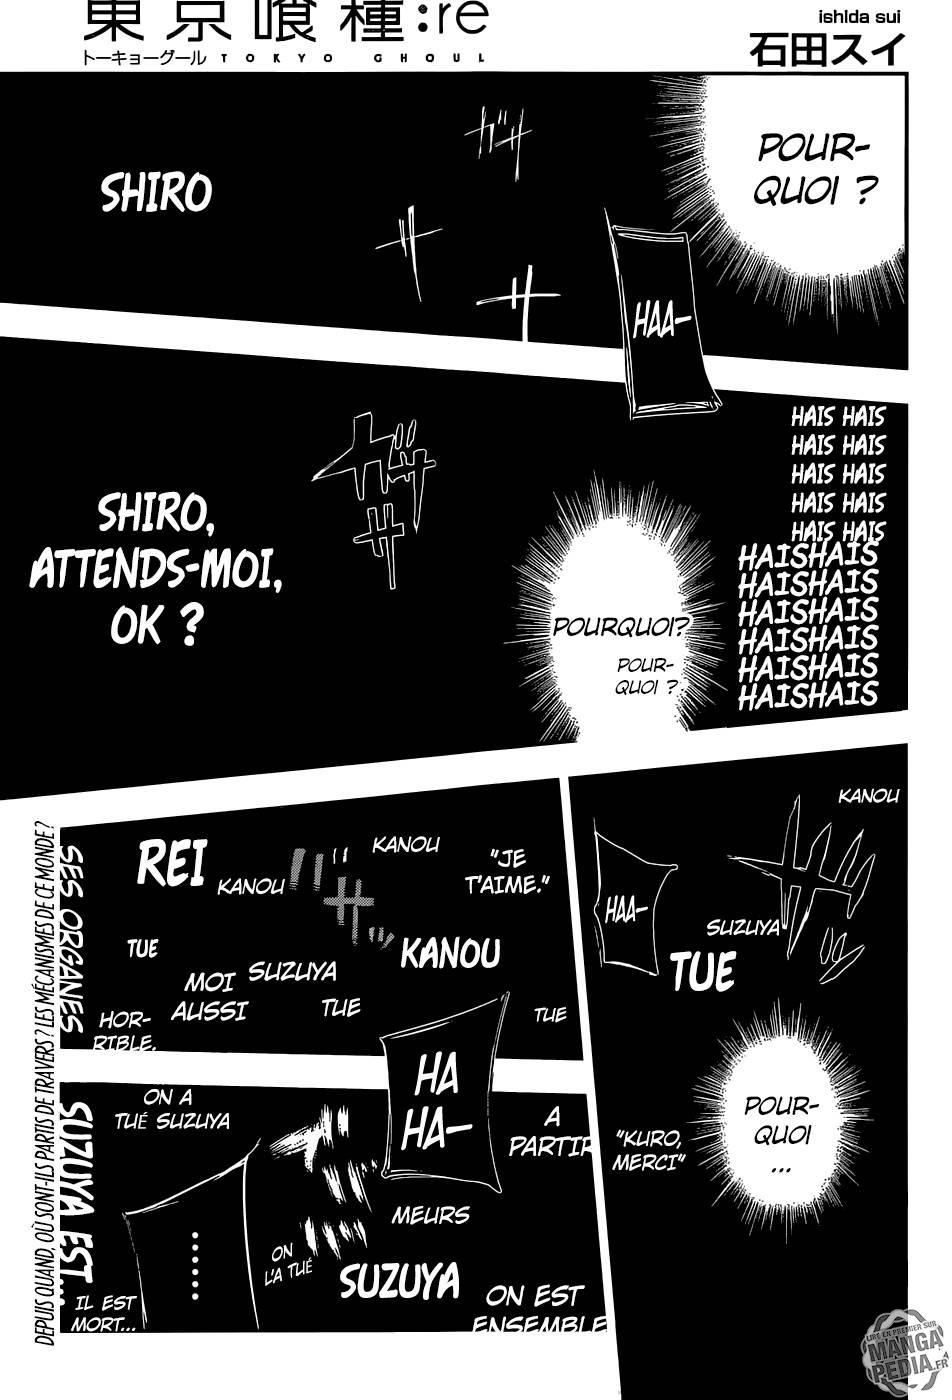 Lecture en ligne Tokyo Ghoul Re 87 page 1